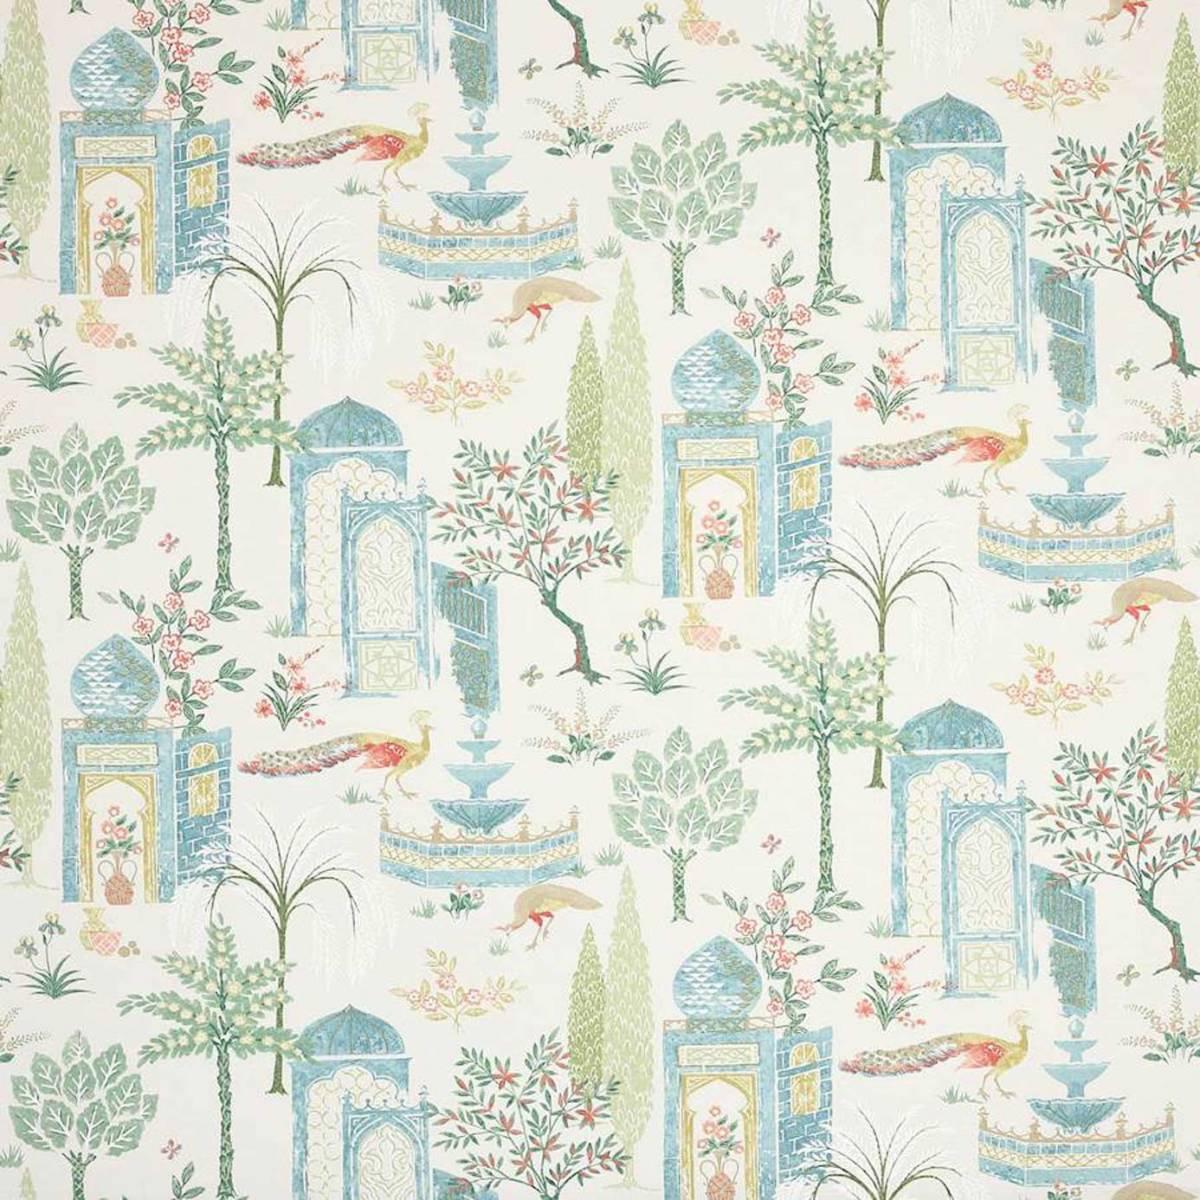 Persian Grove Fabric Teal Aqua J979f 03 Jane